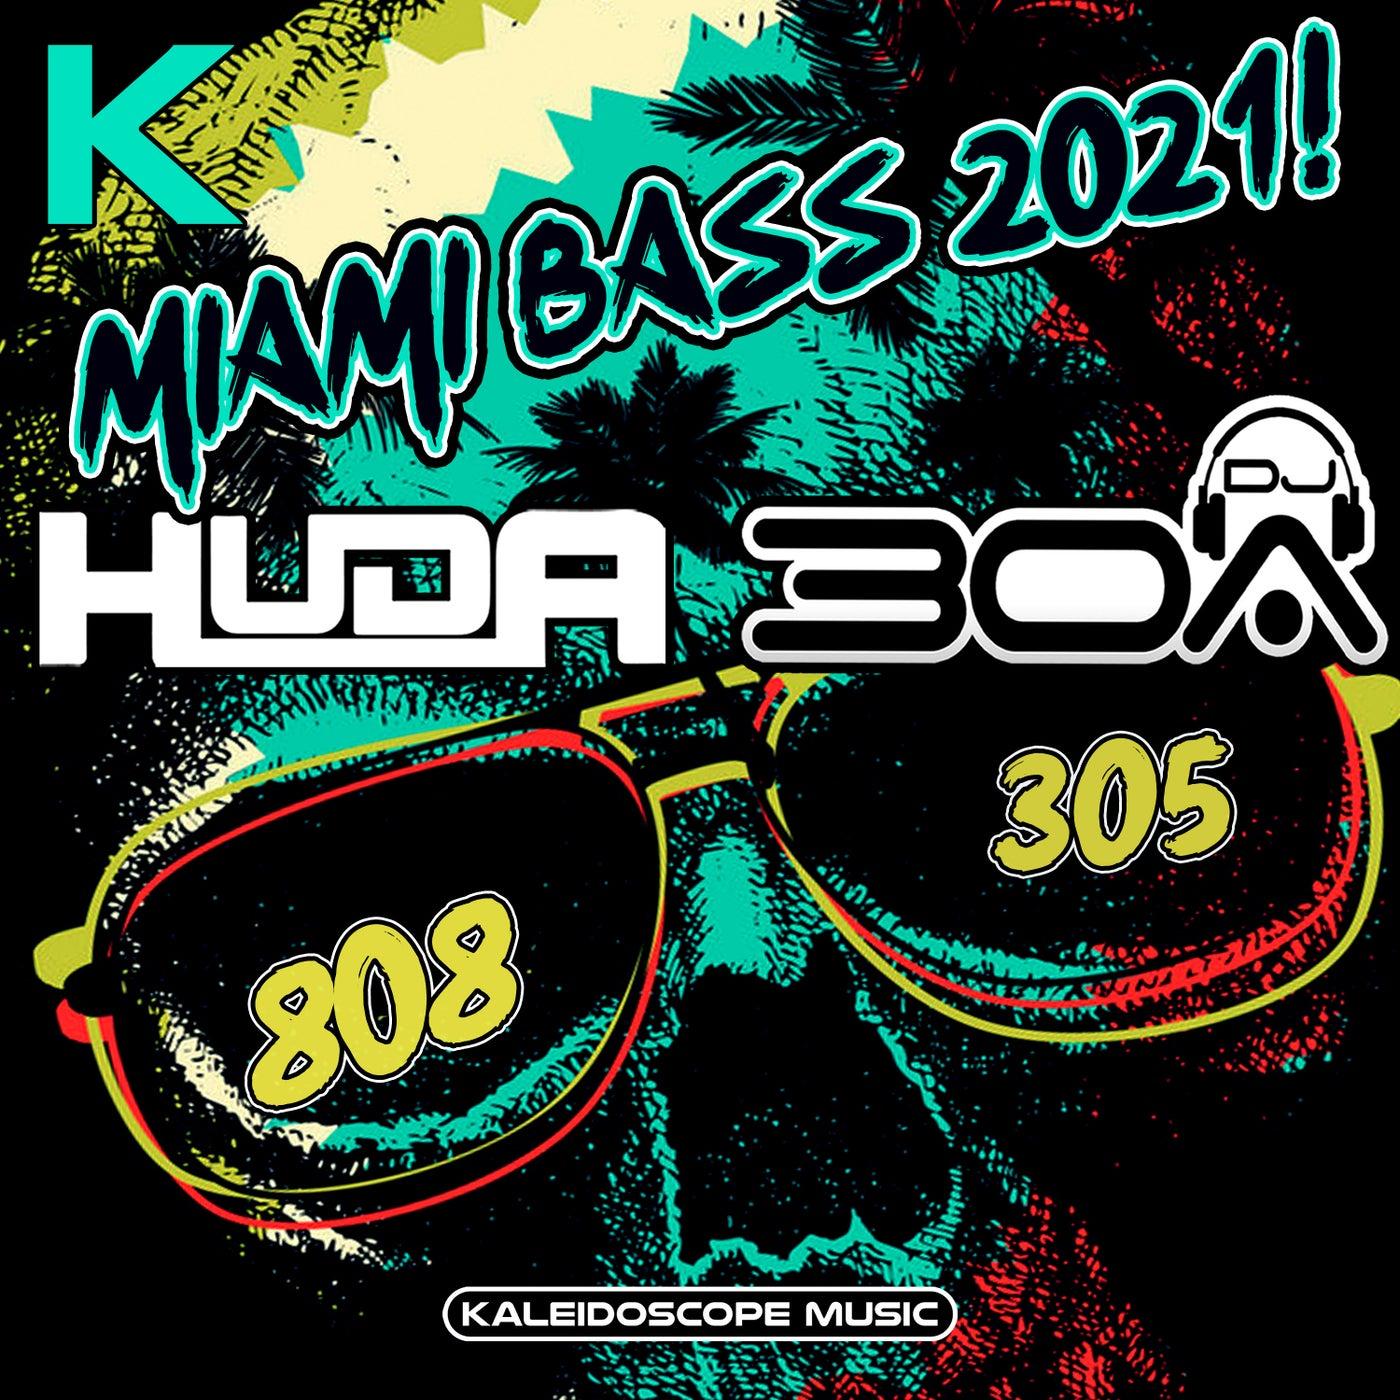 Miami Bass 2021 (Original Mix)